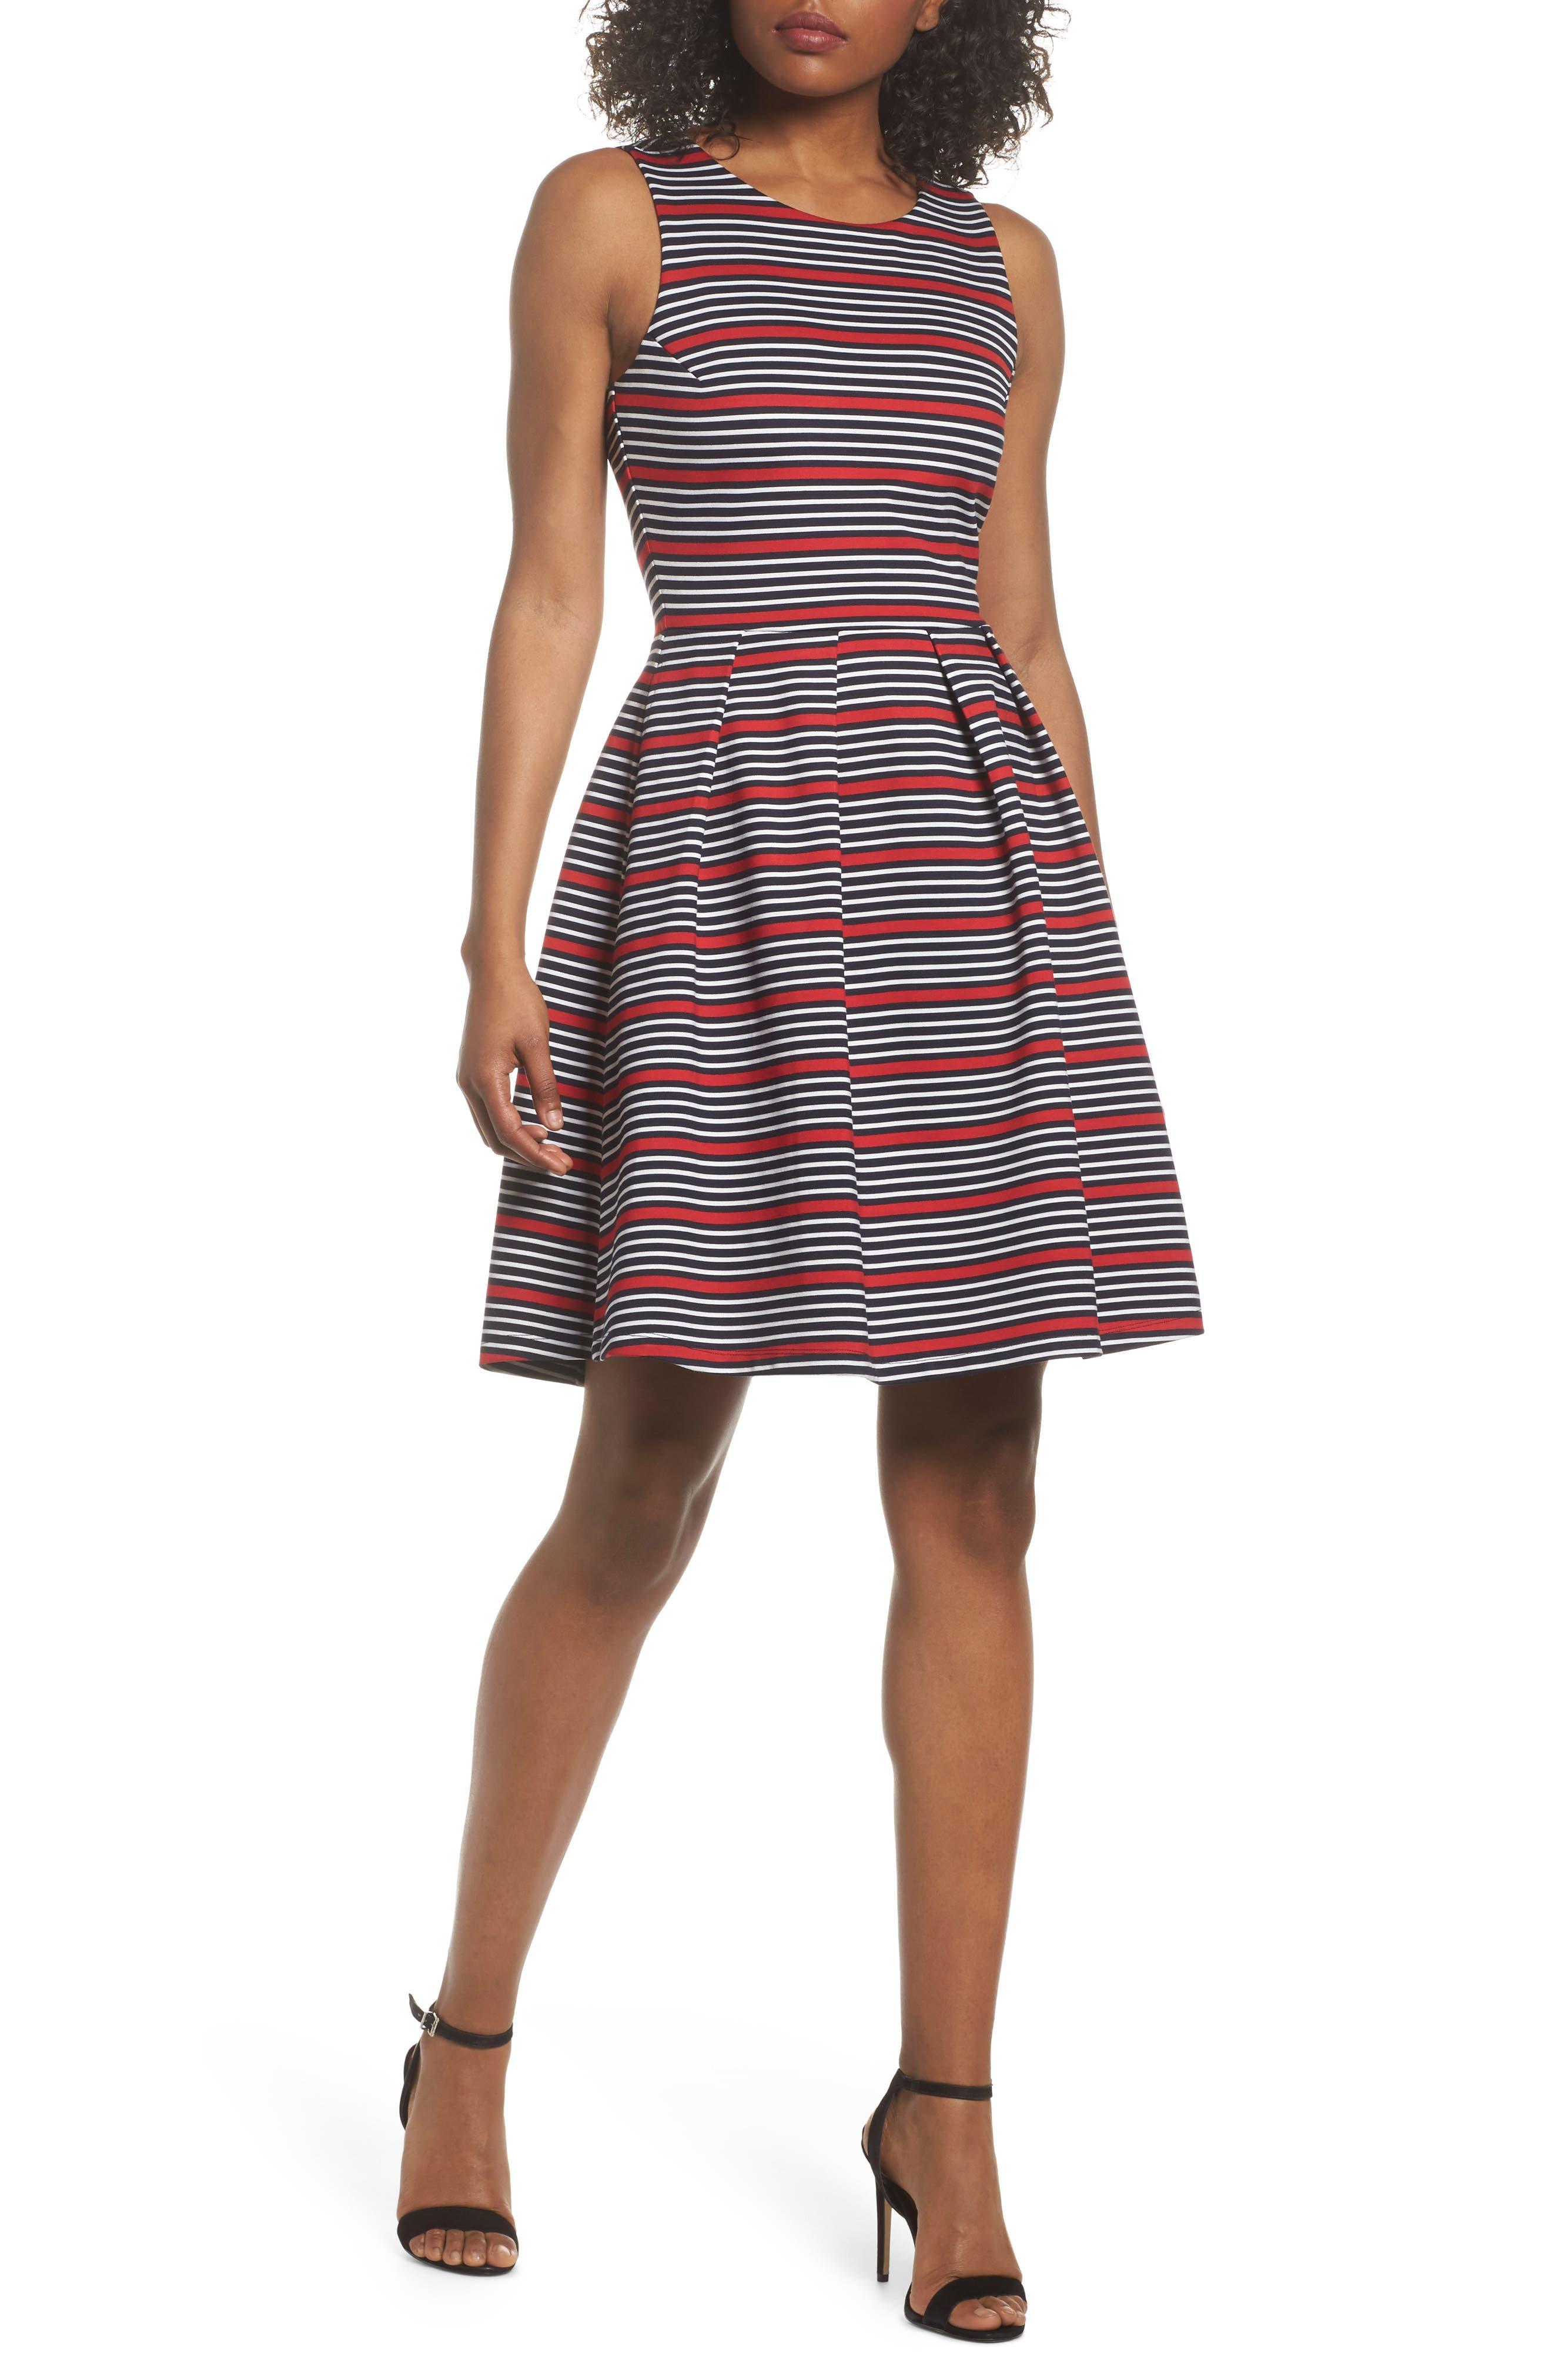 Scarlette Stripe Fit & Flare Dress,                         Main,                         color, Navy/ Red/ White Stripe